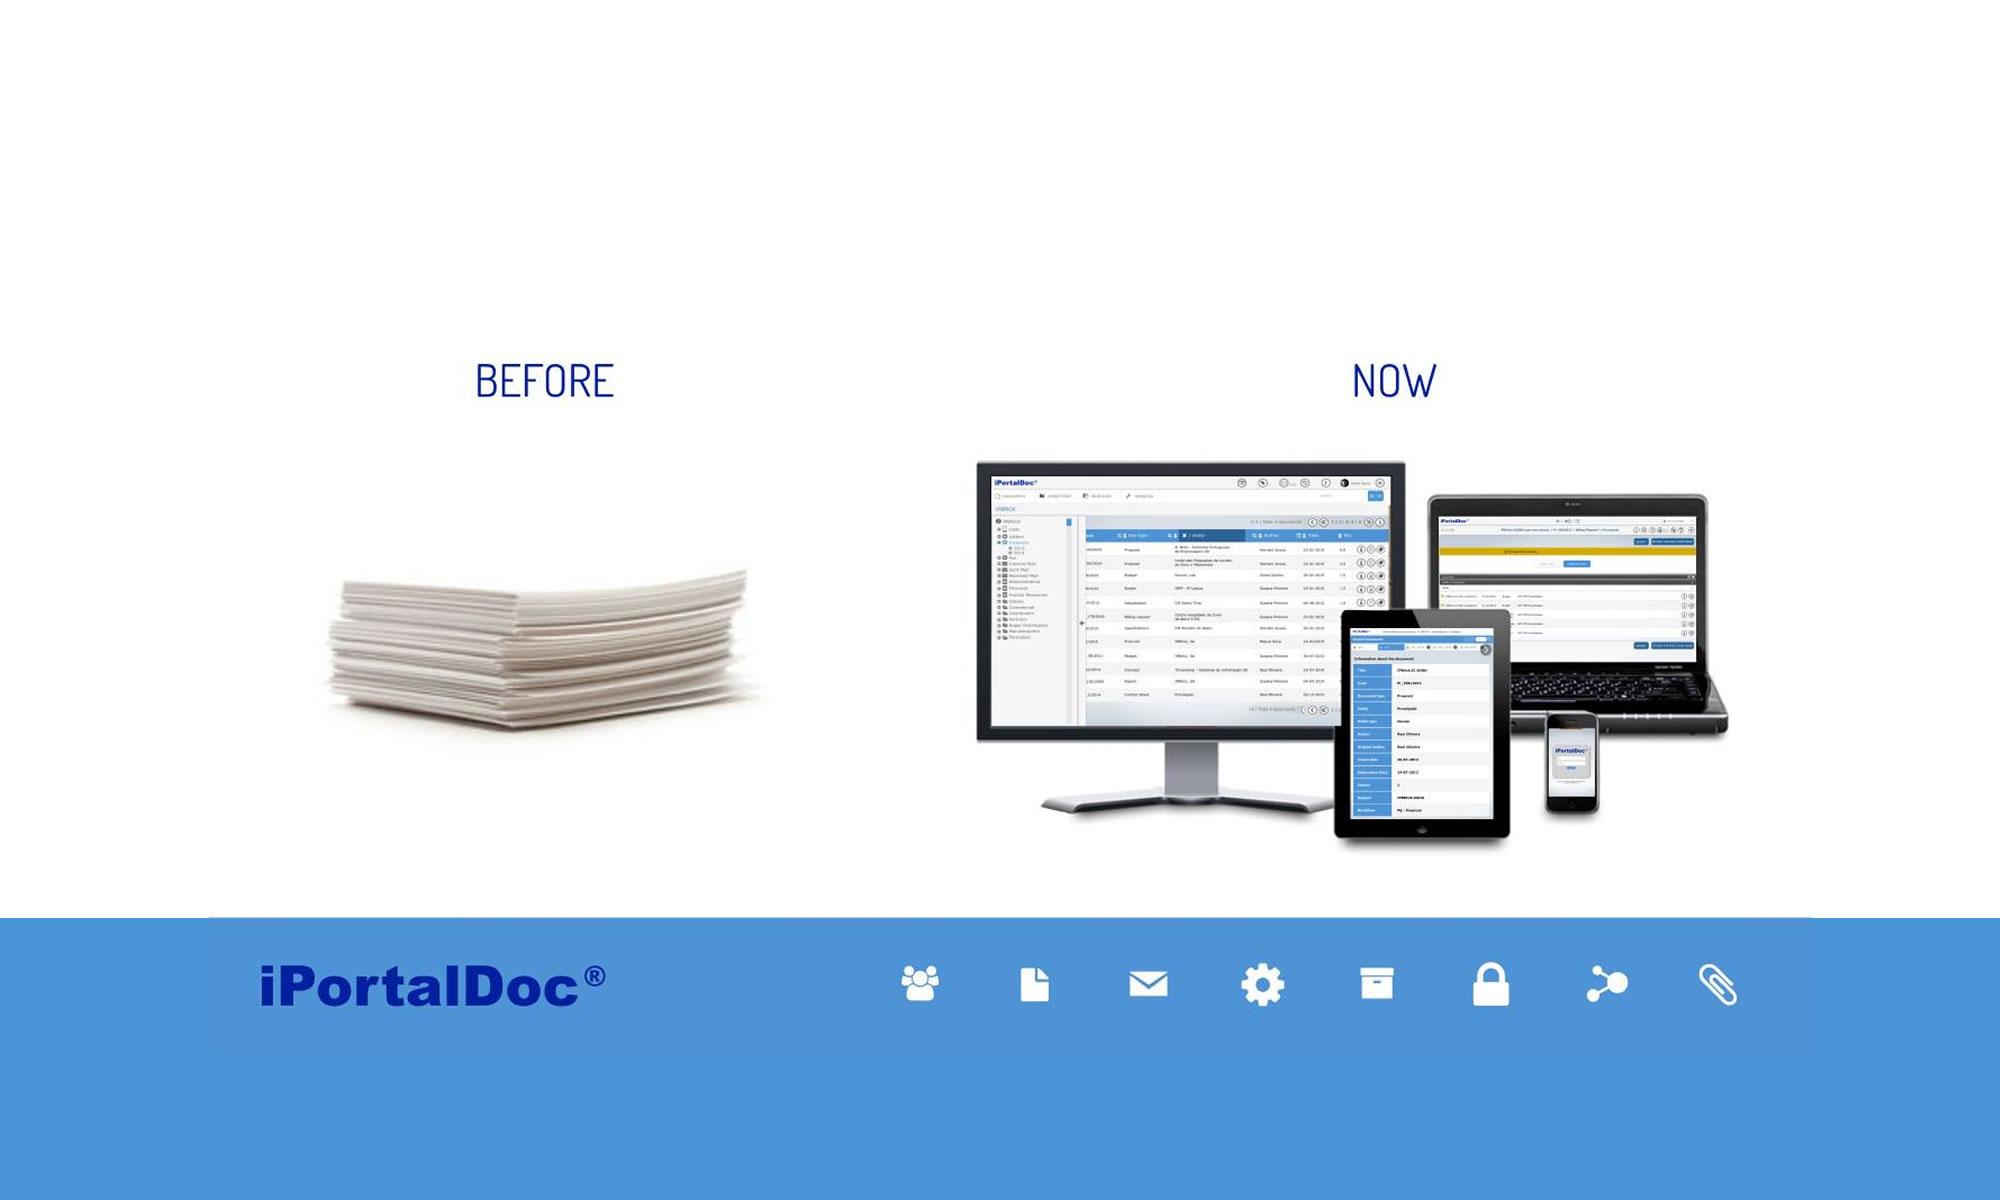 Iportaldoc workflow and document management